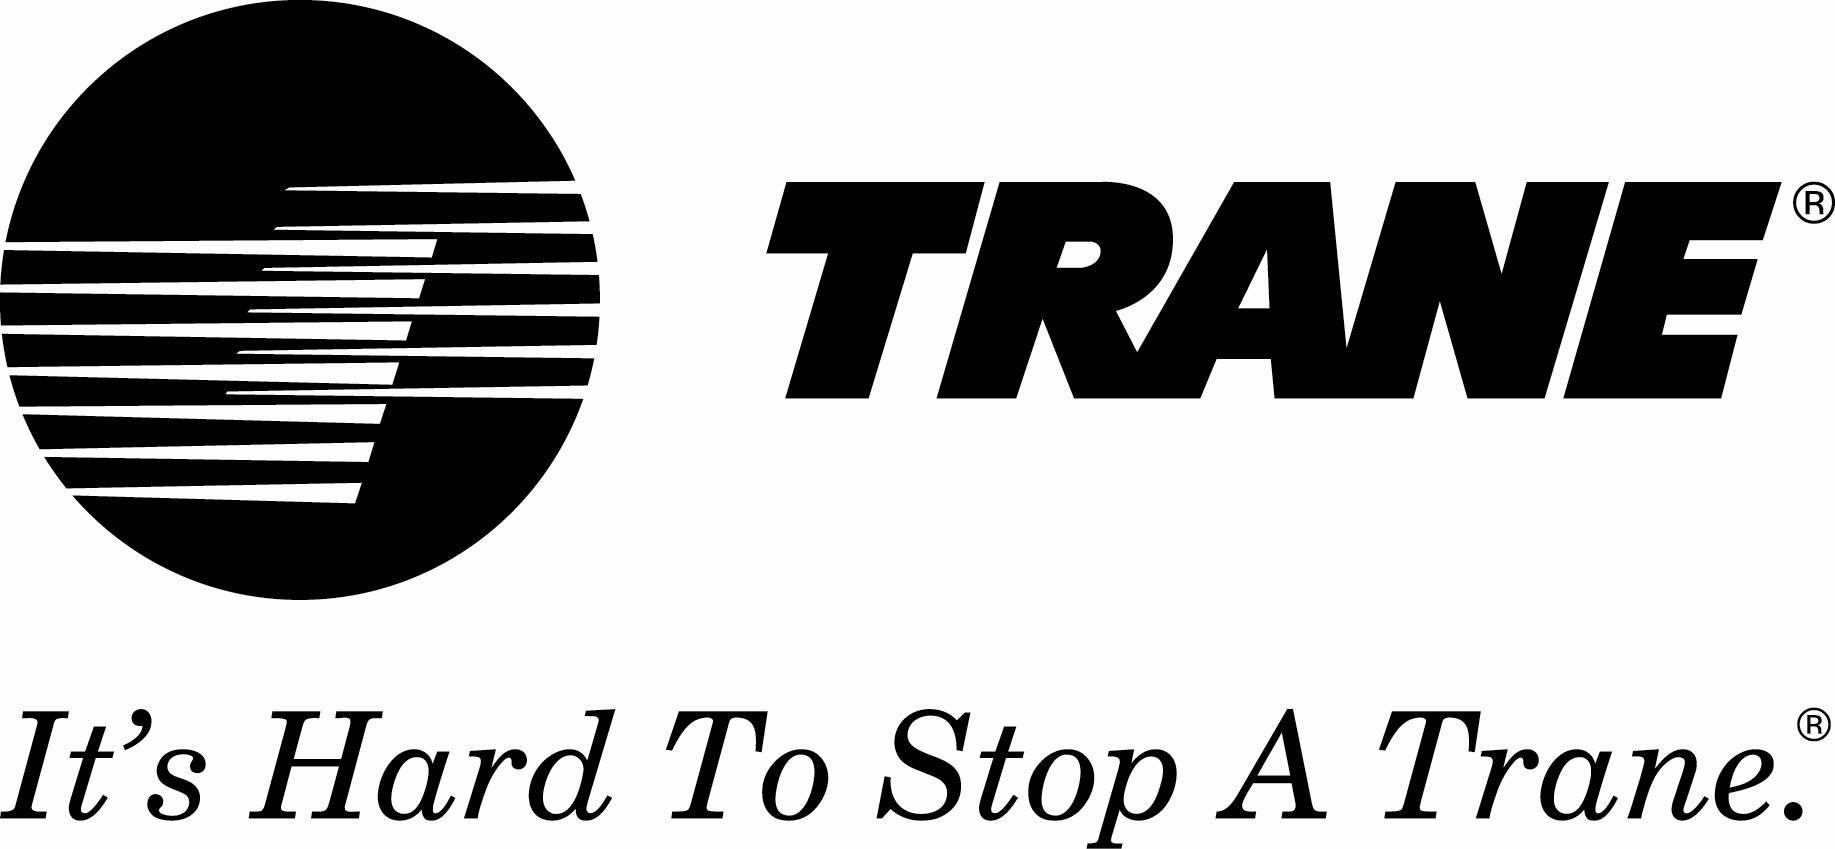 It S Hard To Stop A Trane Hvac Services Trane Air